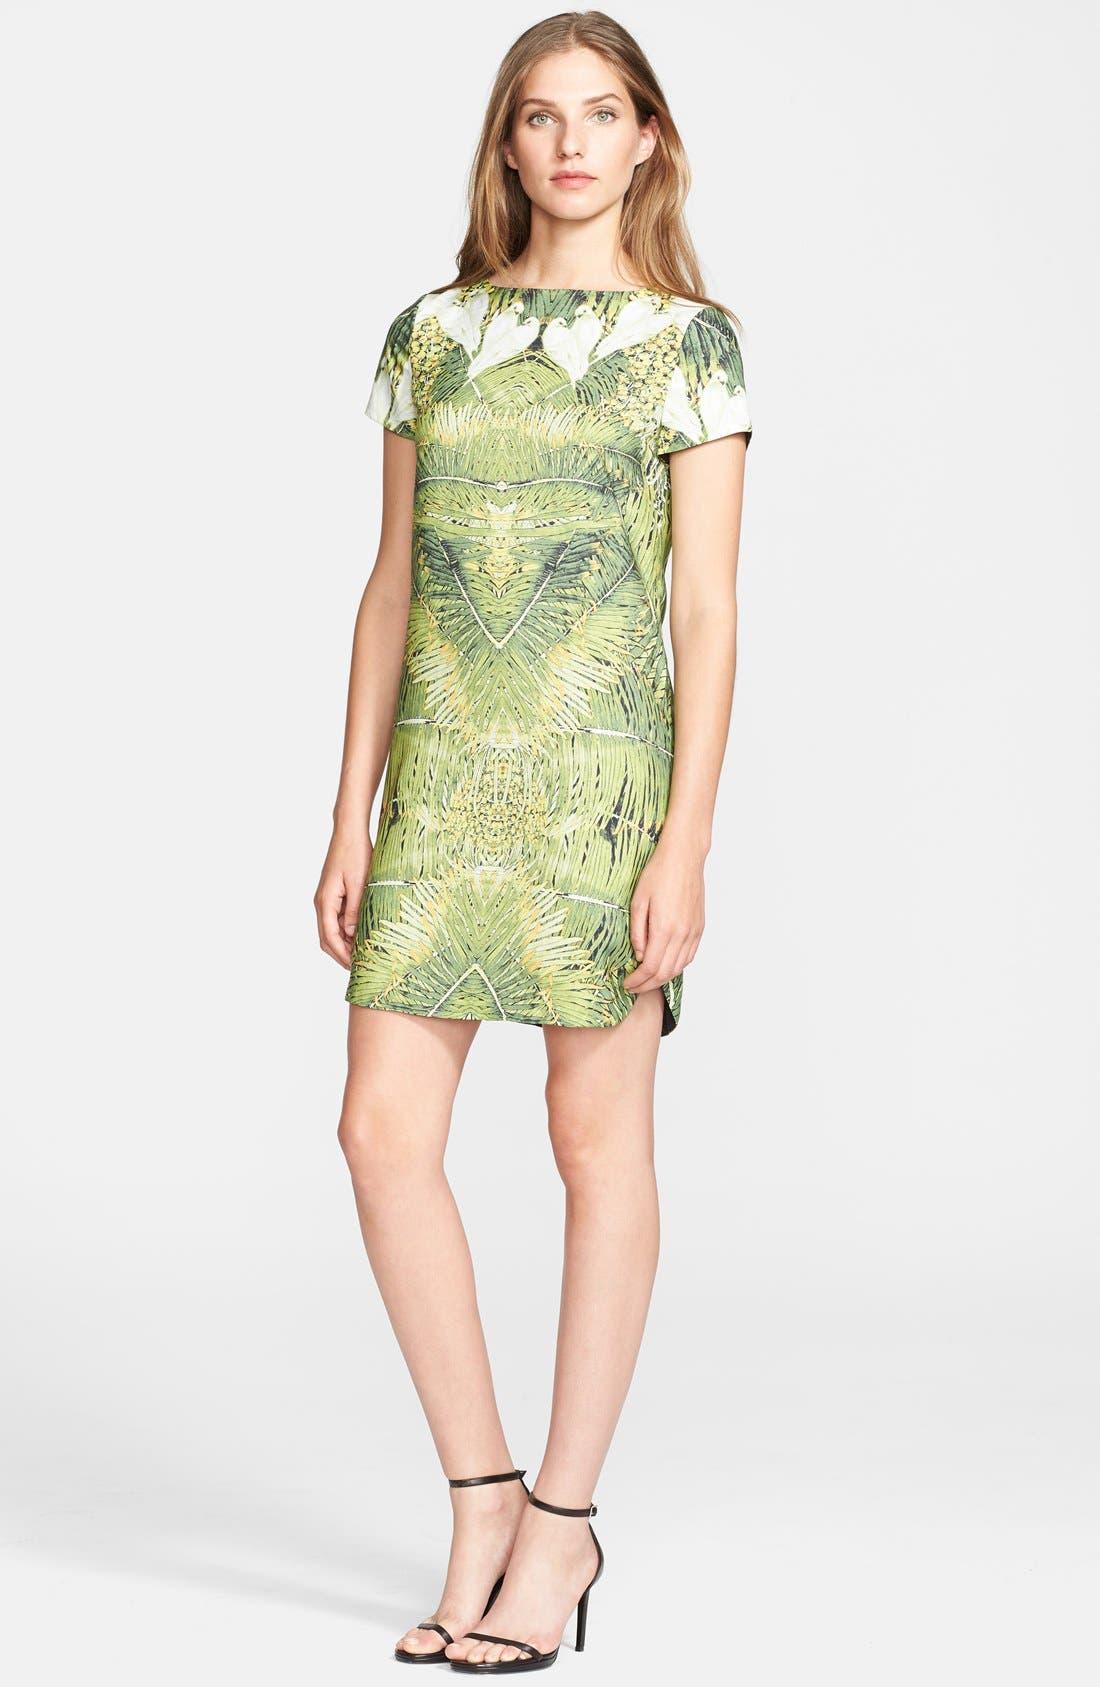 Main Image - Ted Baker London 'Tropical Doves' Print Woven Tunic Dress